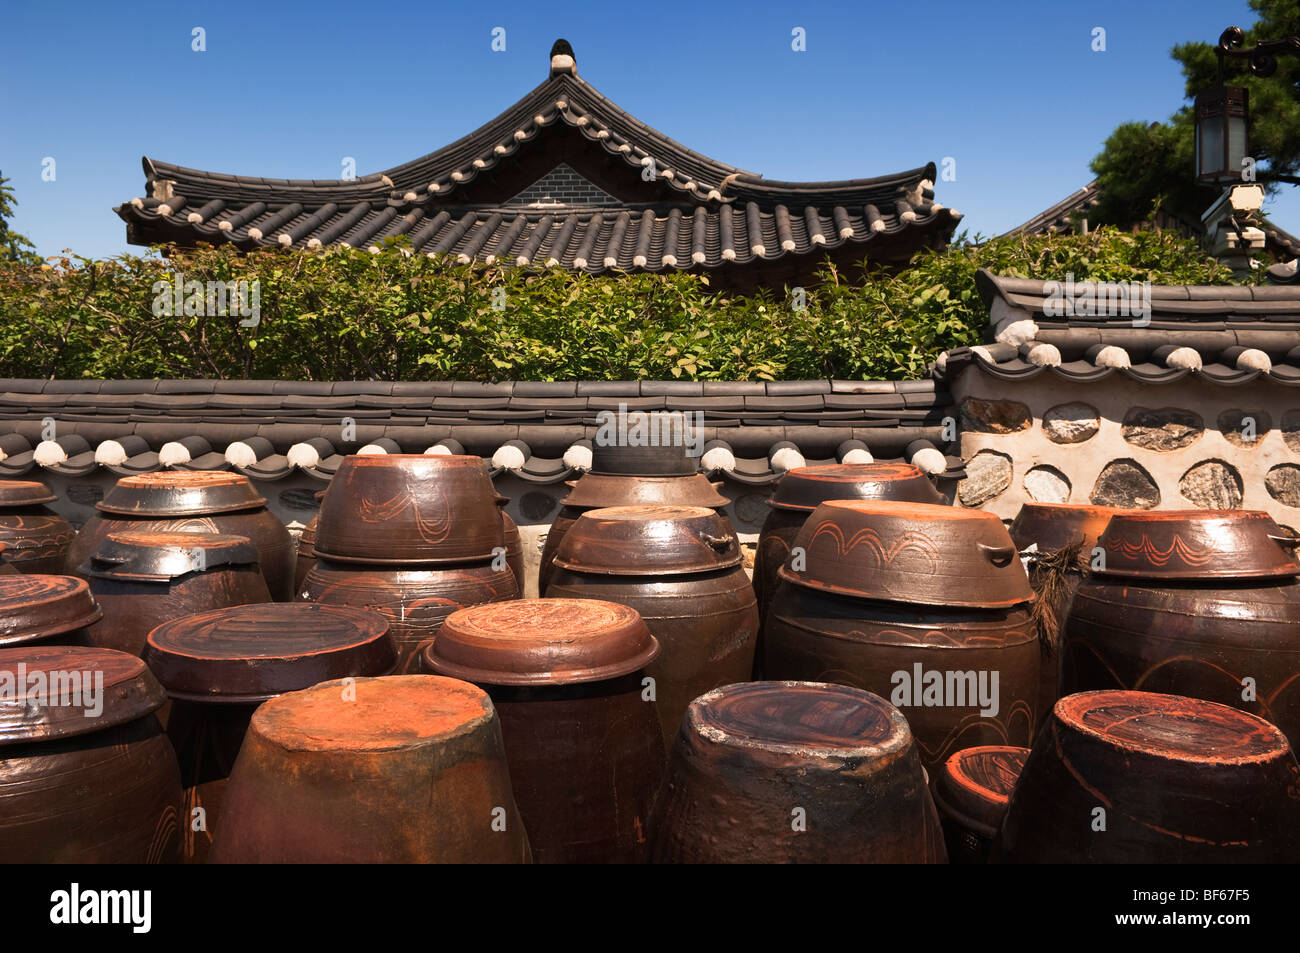 Traditional Ceramic pots for food storage in the Namsangol Hanok Village, Seoul, South Korea. - Stock Image